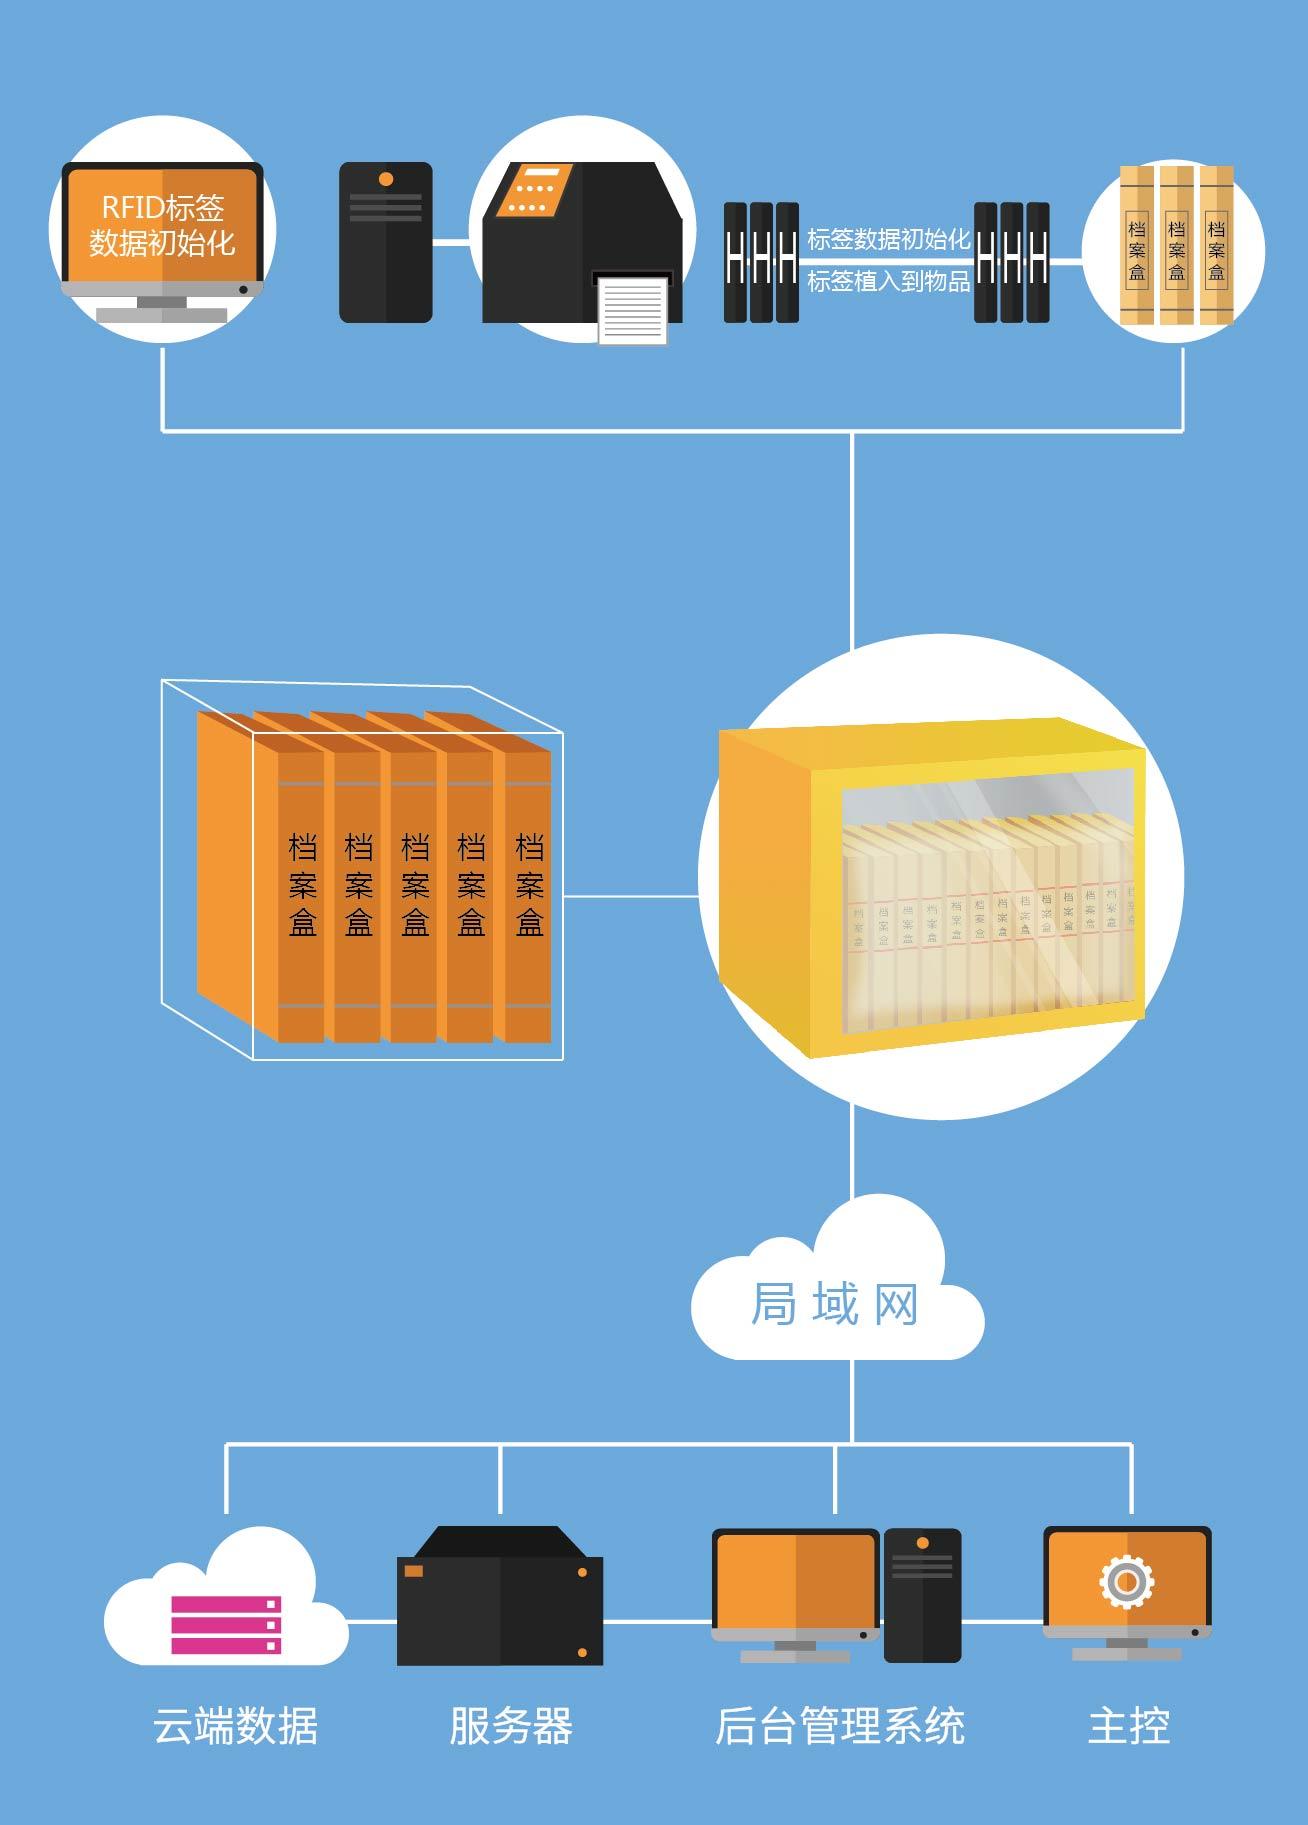 RFID系统拓扑图